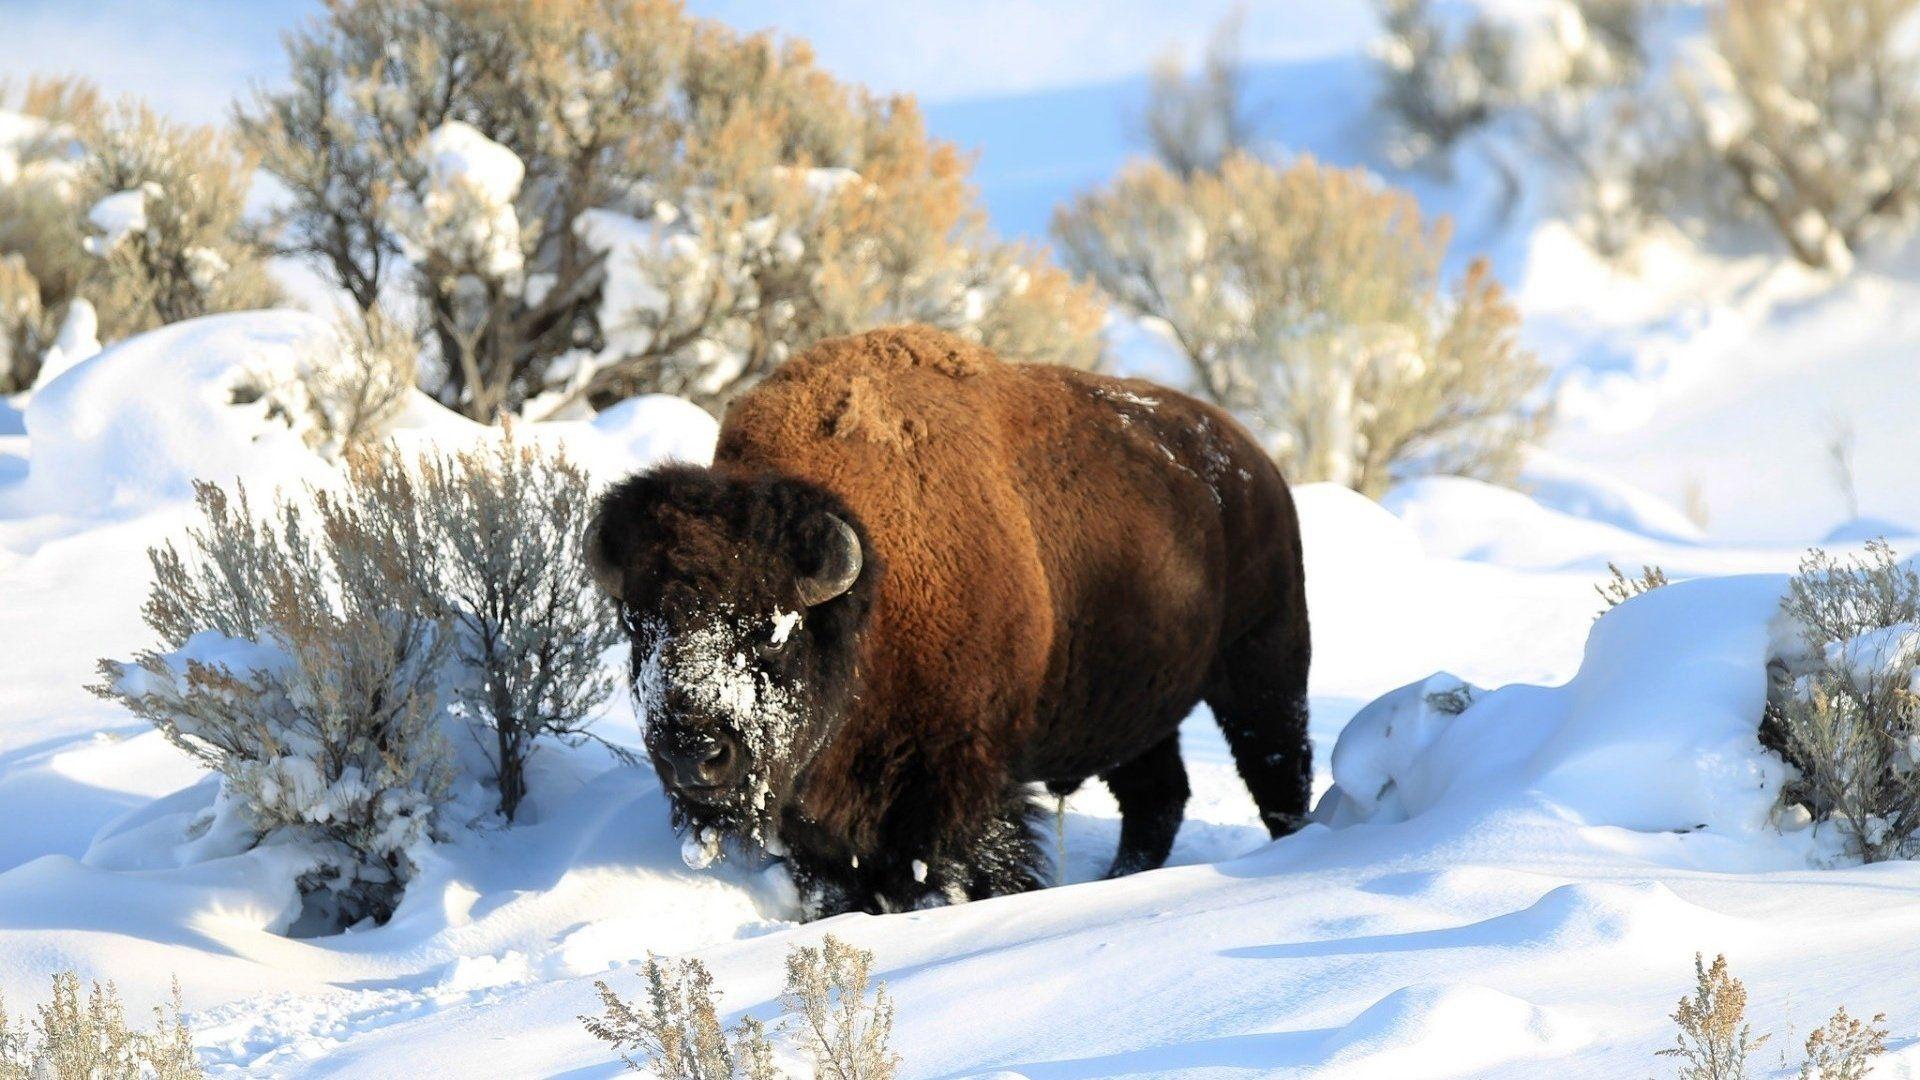 Bison Winter Wallpaper